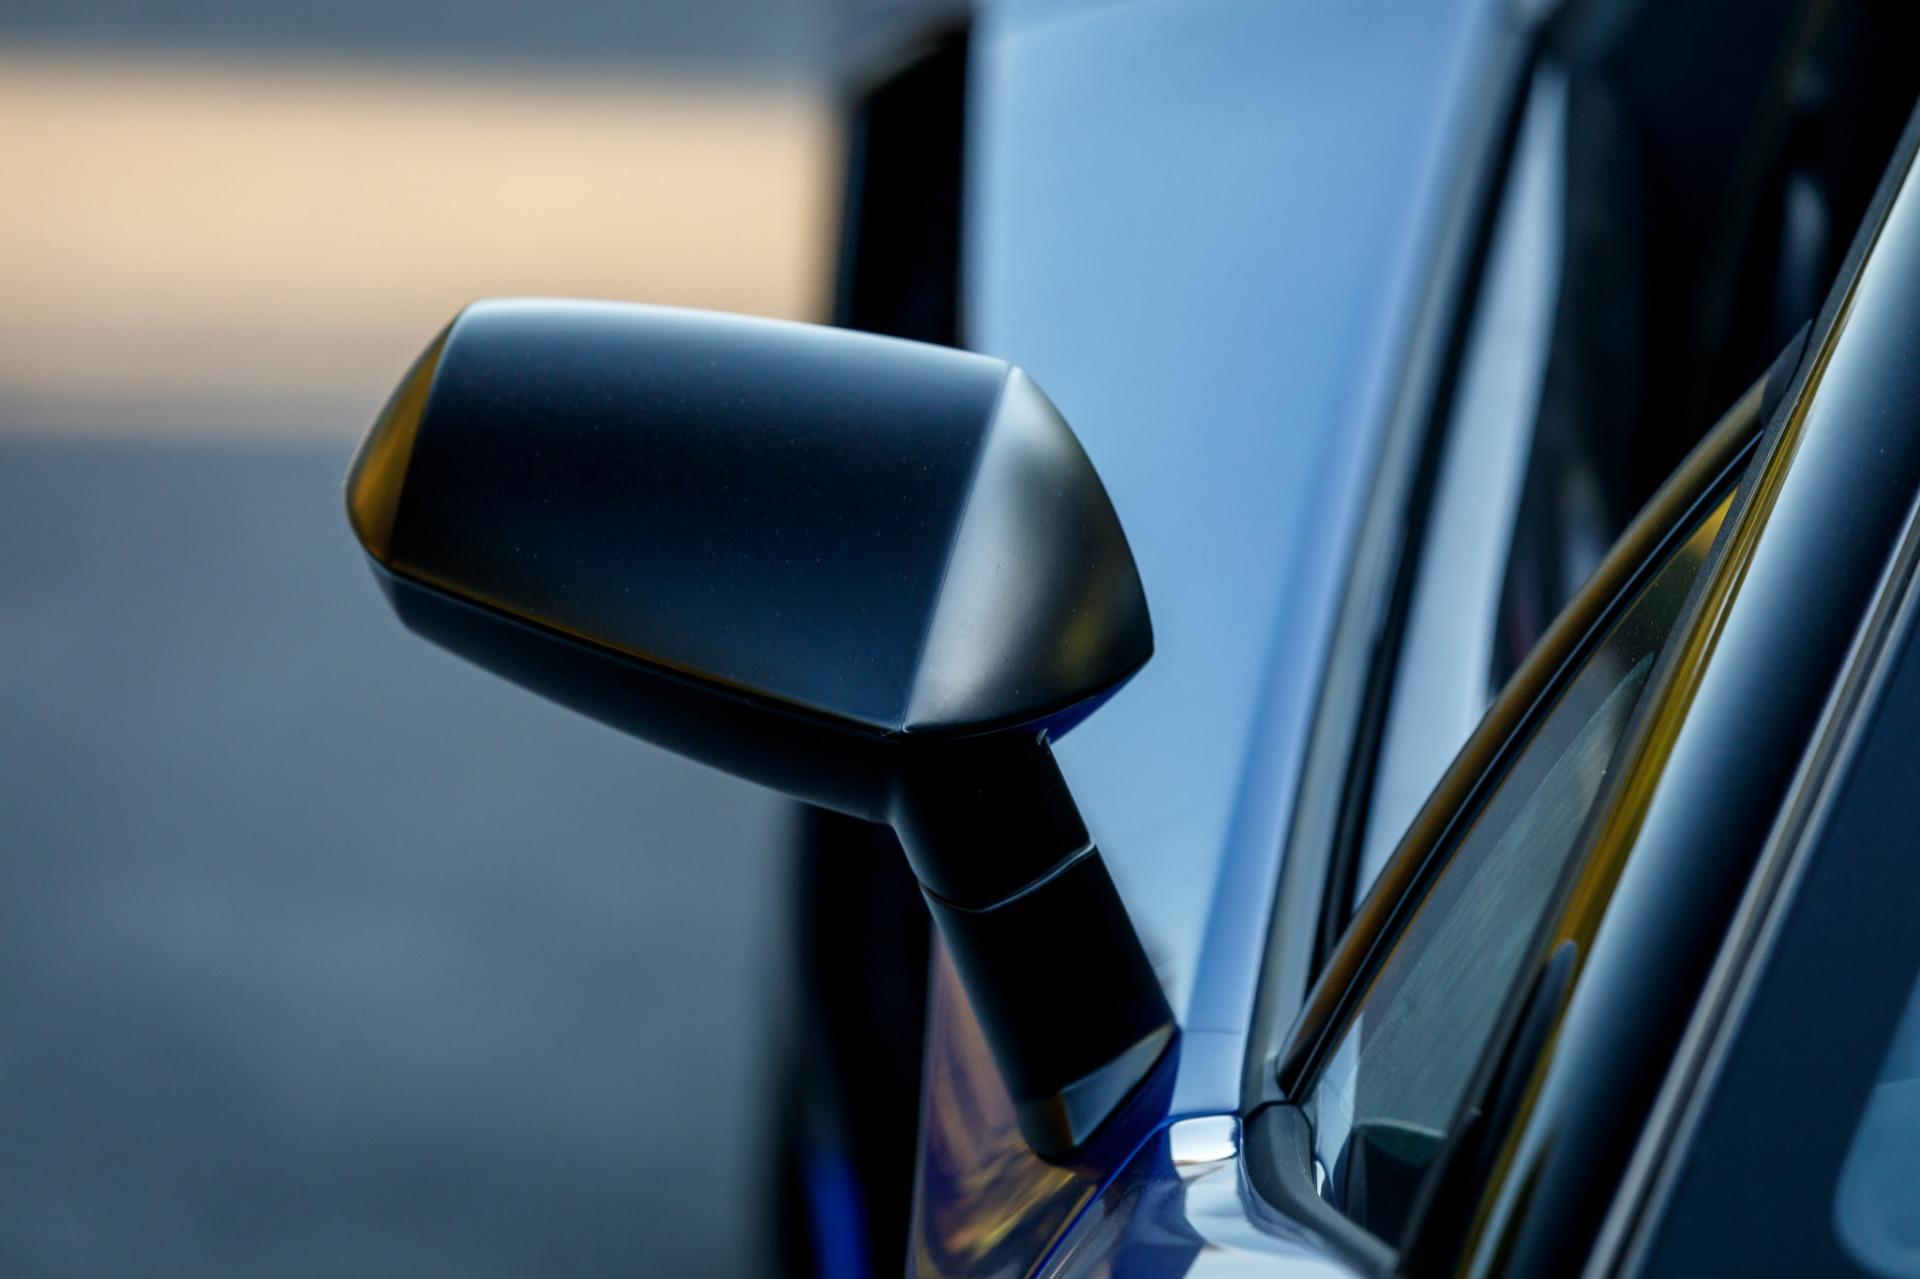 Used 2017 Lamborghini Aventador LP 750-4 SV / 740HP / AWD / 1930 MI / NAV / CAMERA for sale Sold at Formula Imports in Charlotte NC 28227 29